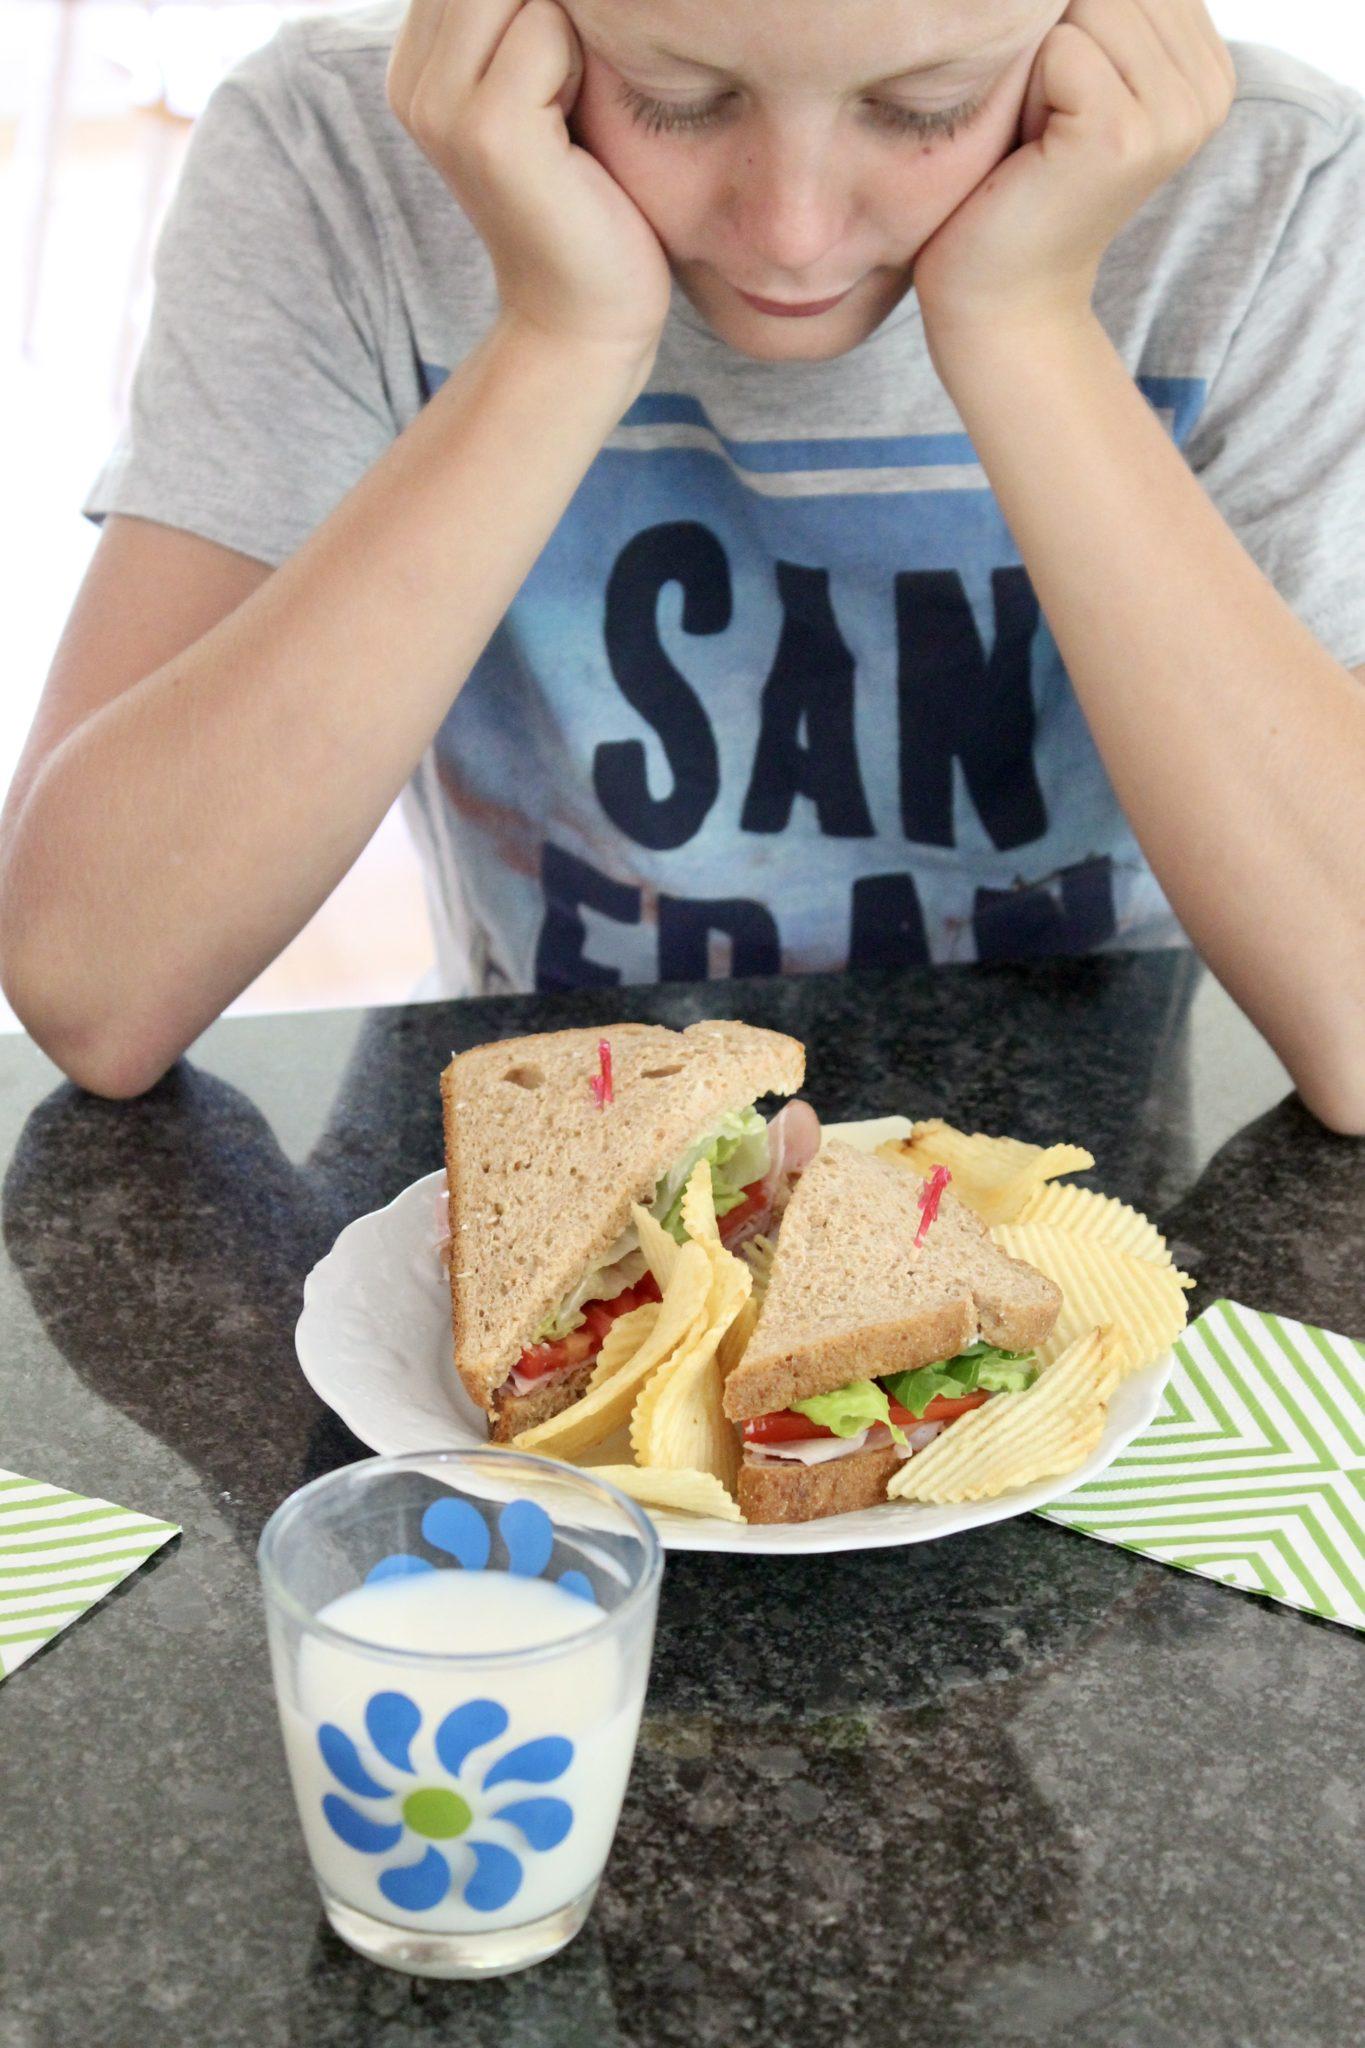 The Shifter sandwich